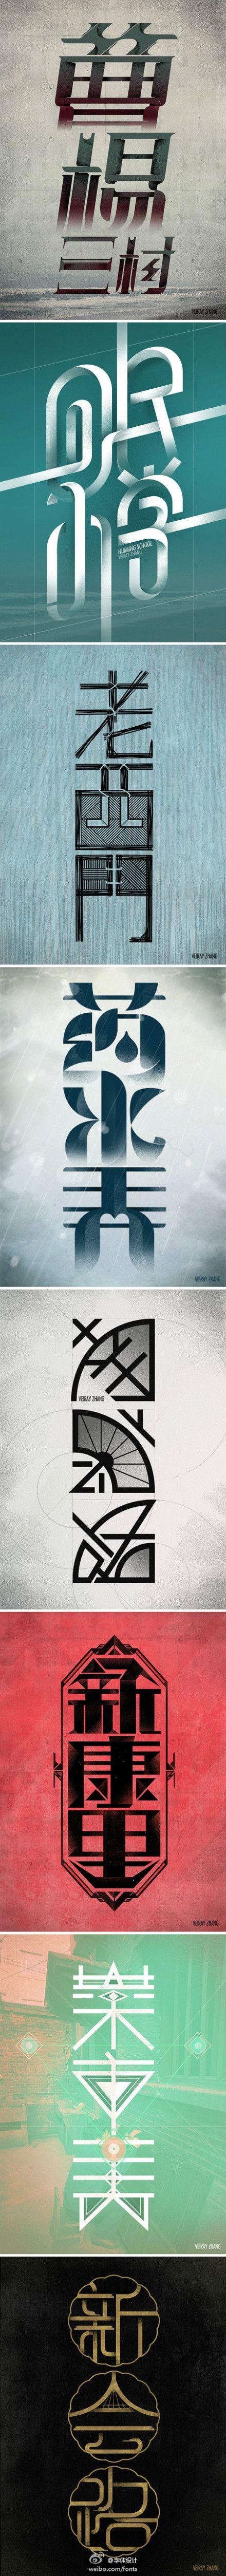 上海关键词,来自@Veiray Zhang Zhang 的字体设计作品